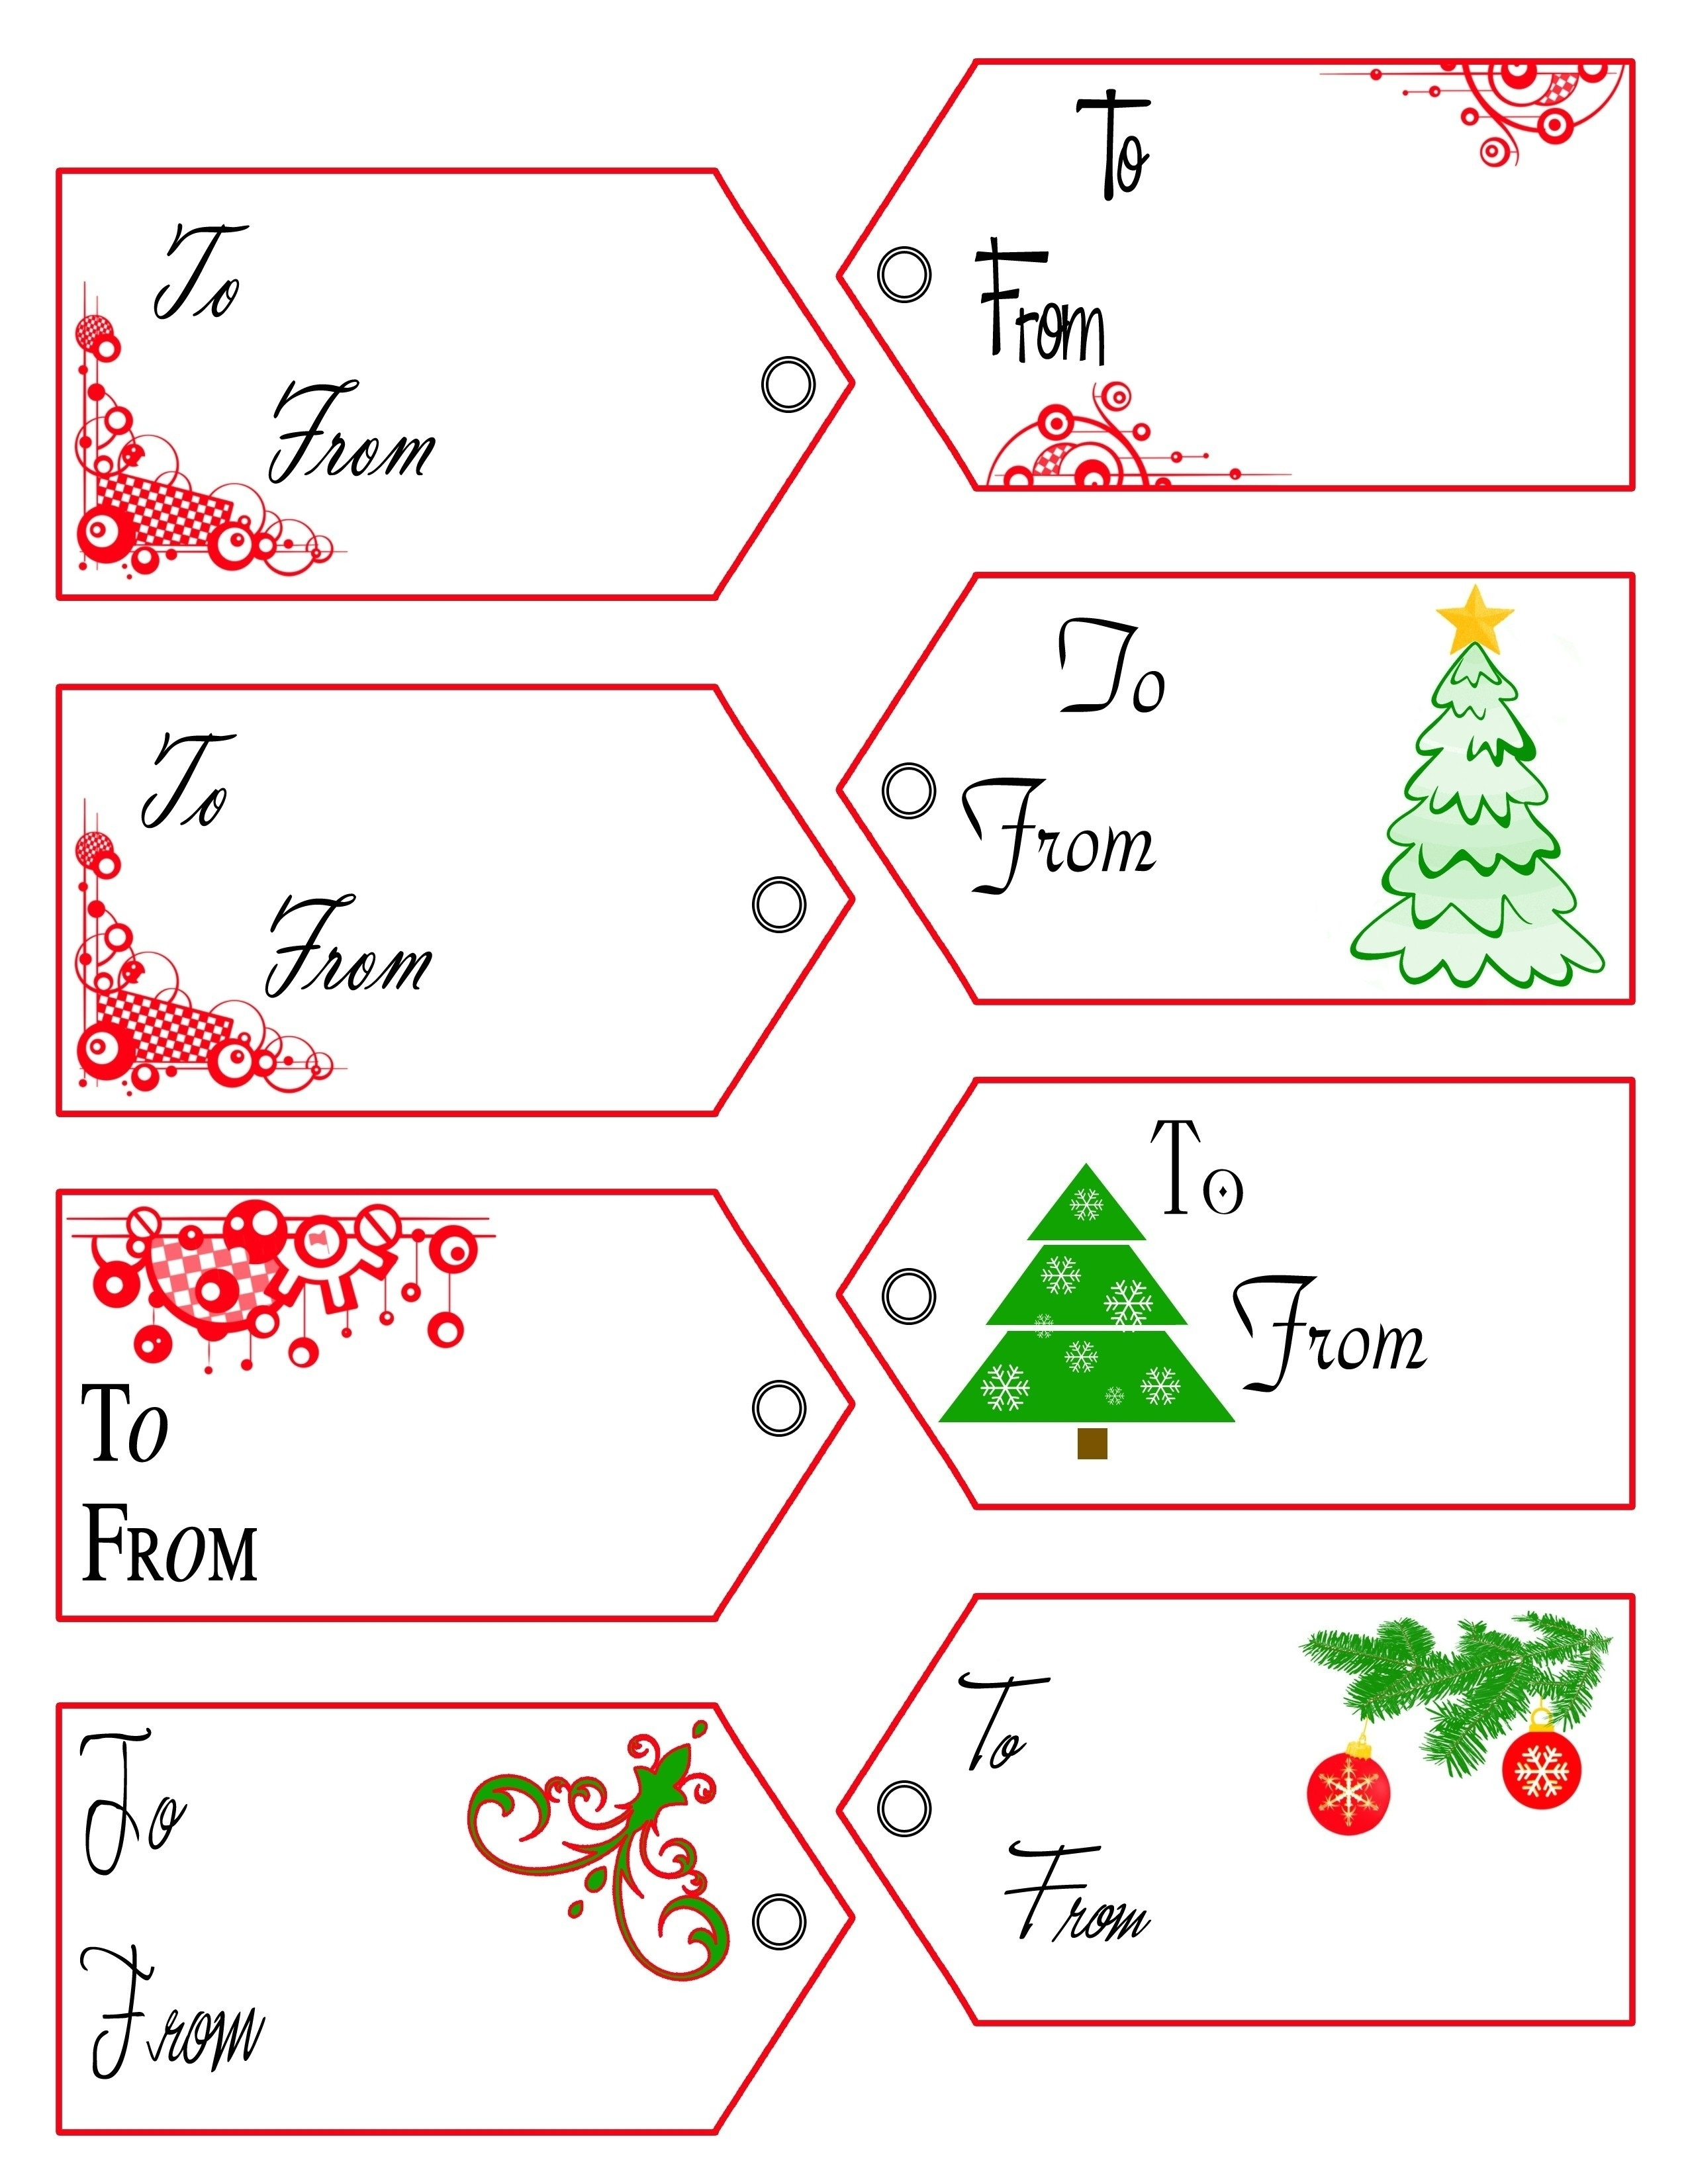 Free Printable Tag Templates 2018 | Corner Of Chart And Menu - Free Printable Gift Tags Templates